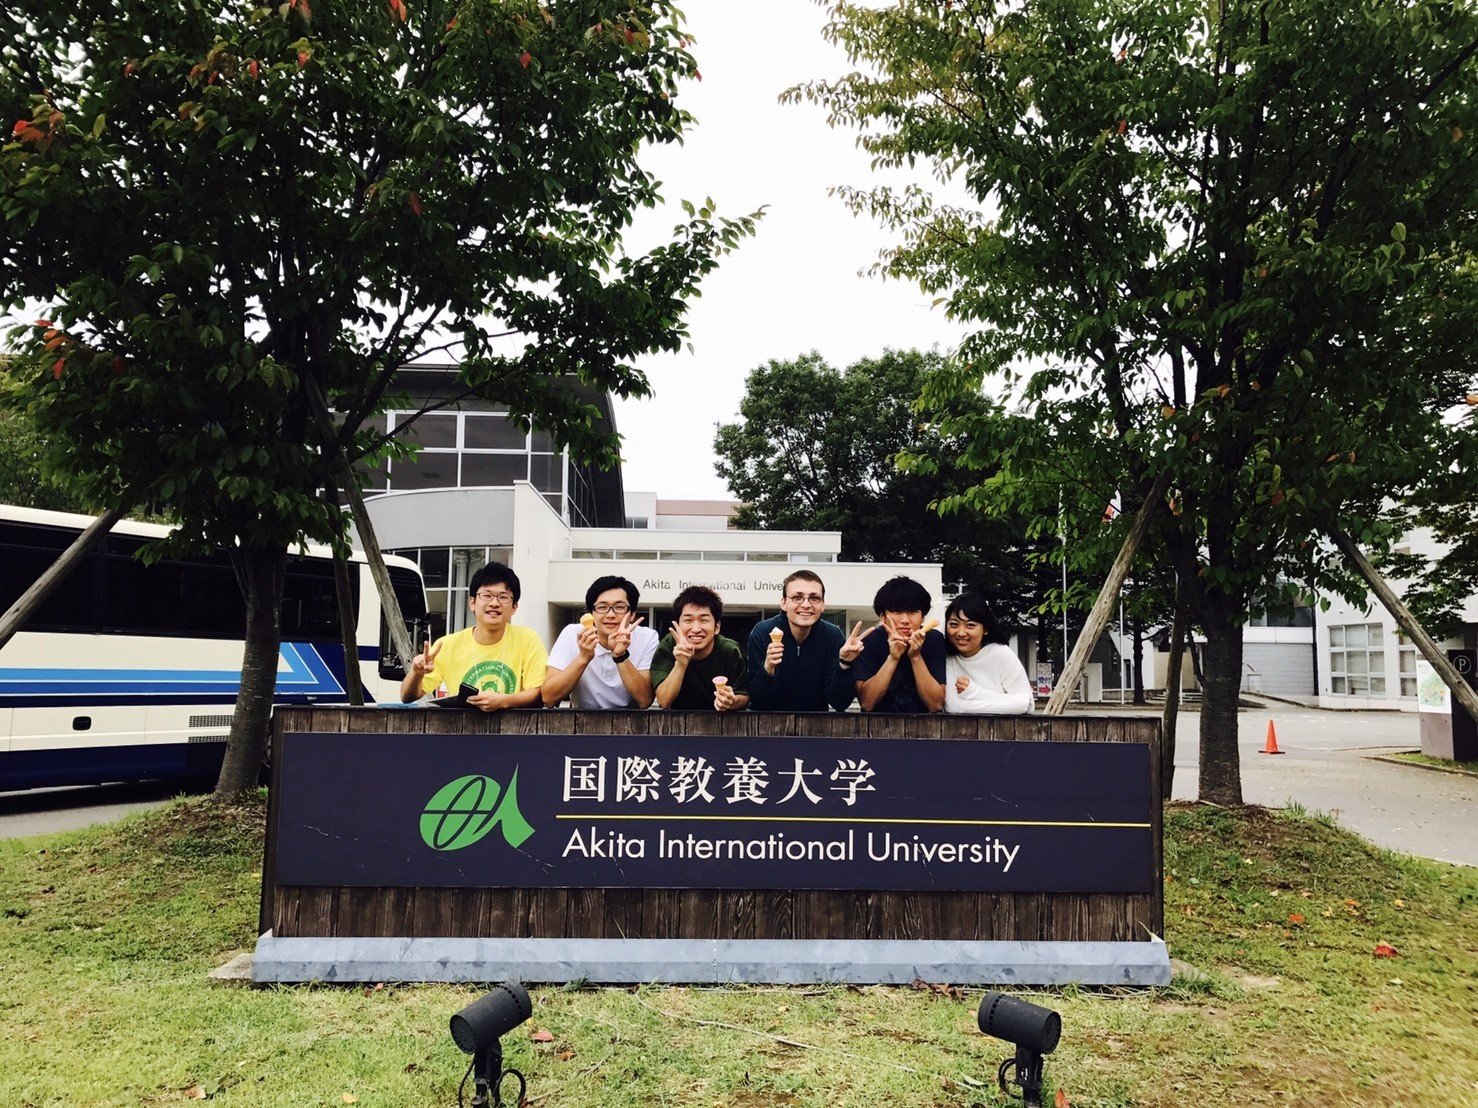 Sebastian Sbirna Aalborg University Denmark Akita International University Japan